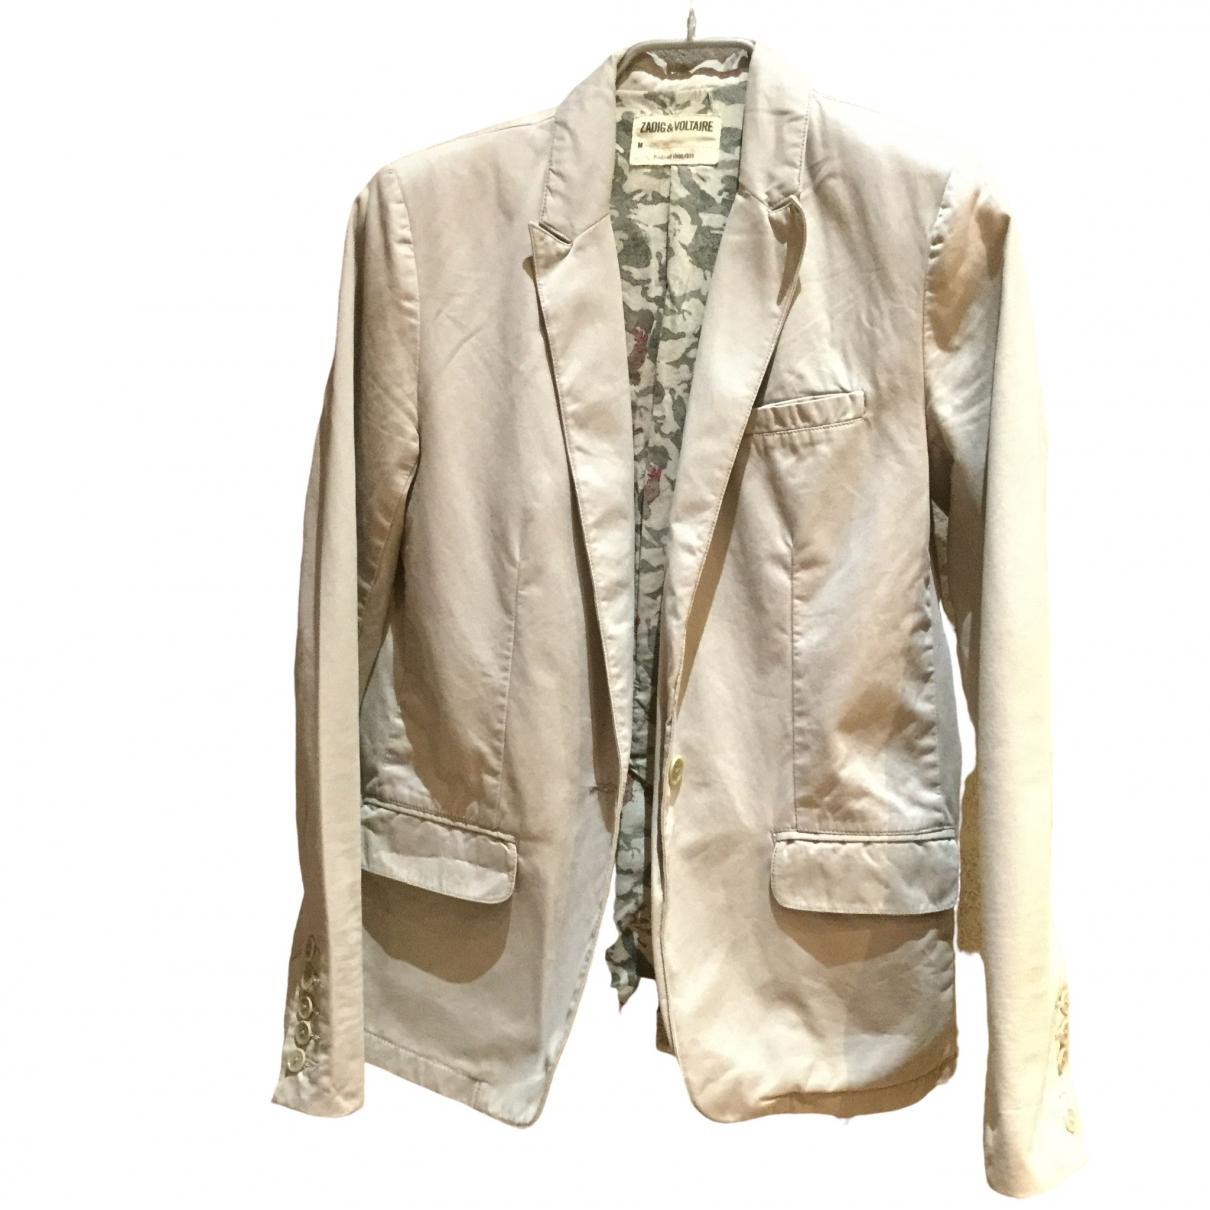 Zadig & Voltaire \N Beige Cotton jacket for Women S International